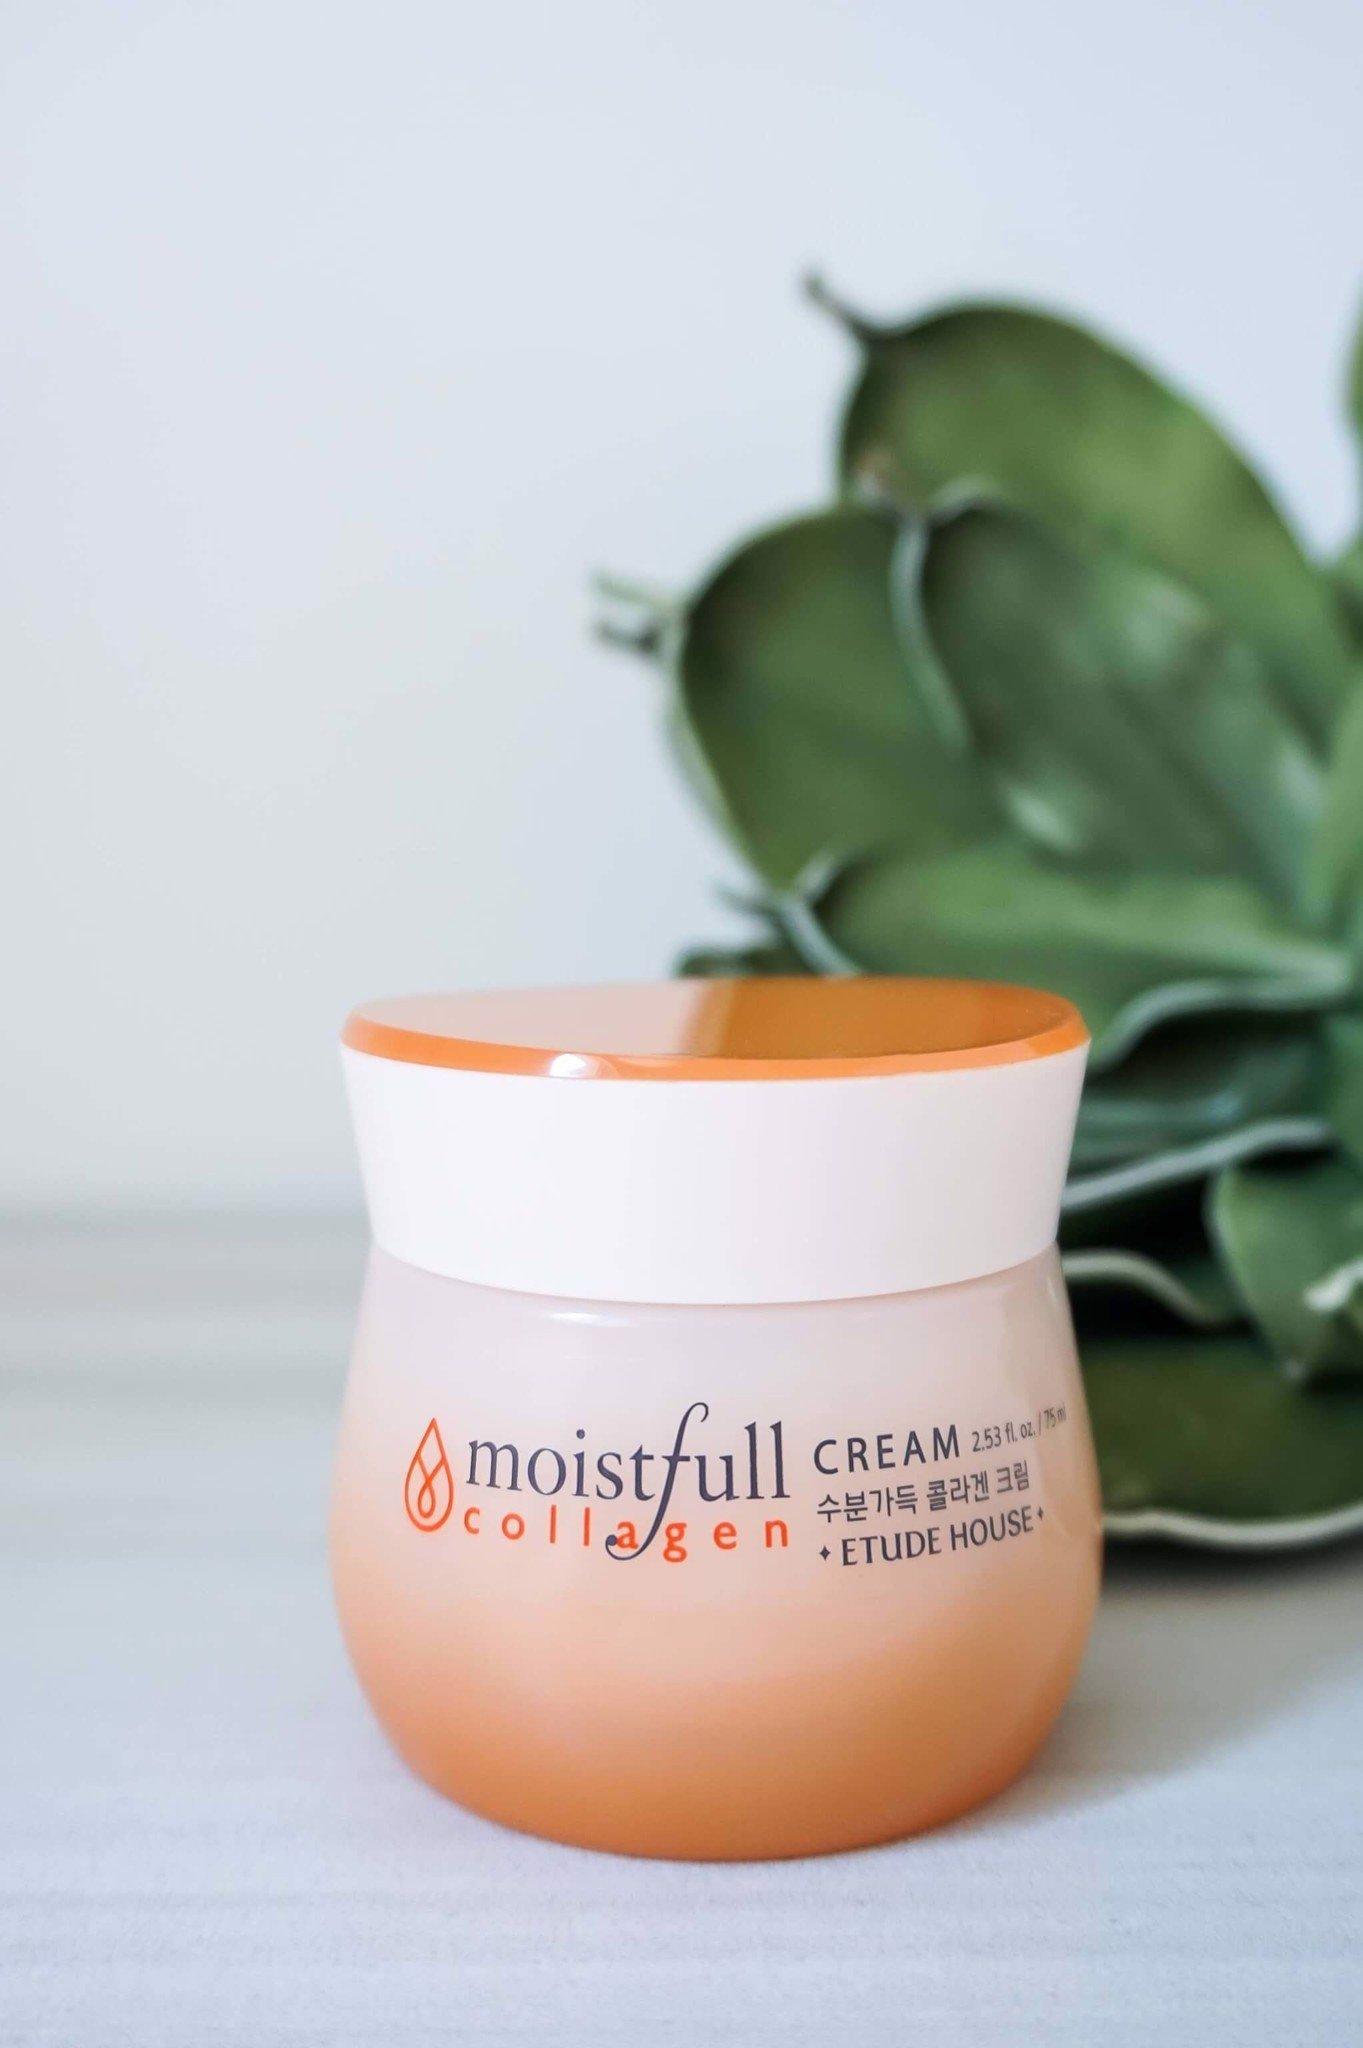 Kem dưỡng Étude House Moisfull Collagen Cream-bicicosmetics.vn